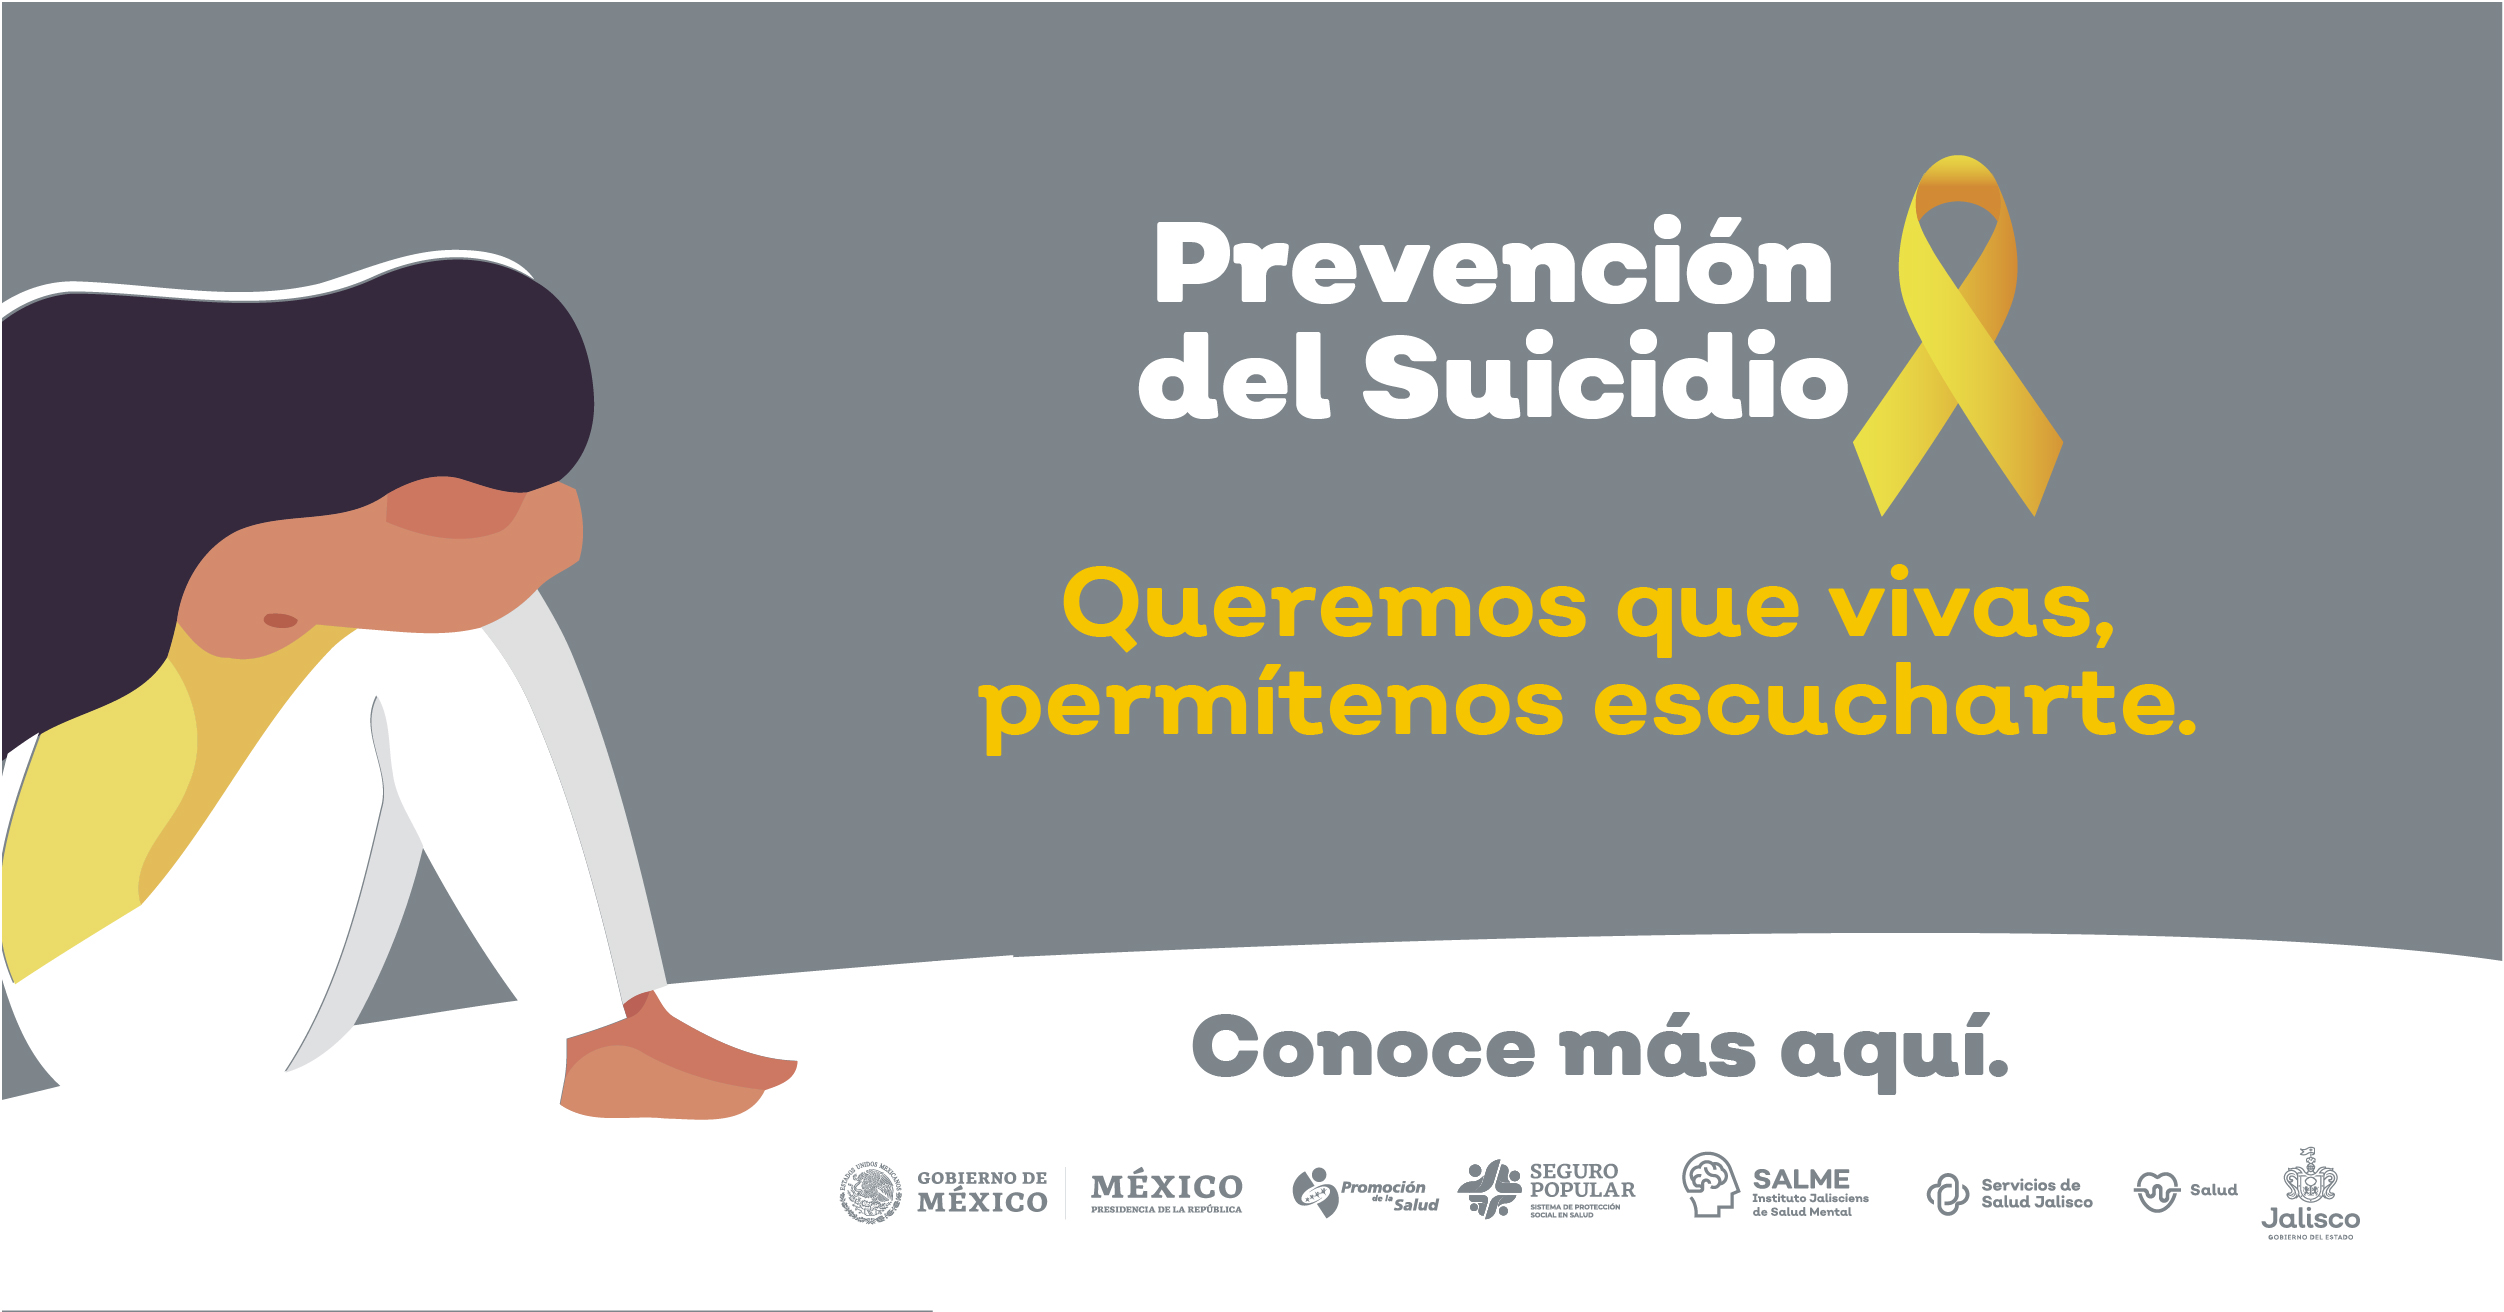 Prevención del Suicidio, Queremos que vivas, permítenos escucharte